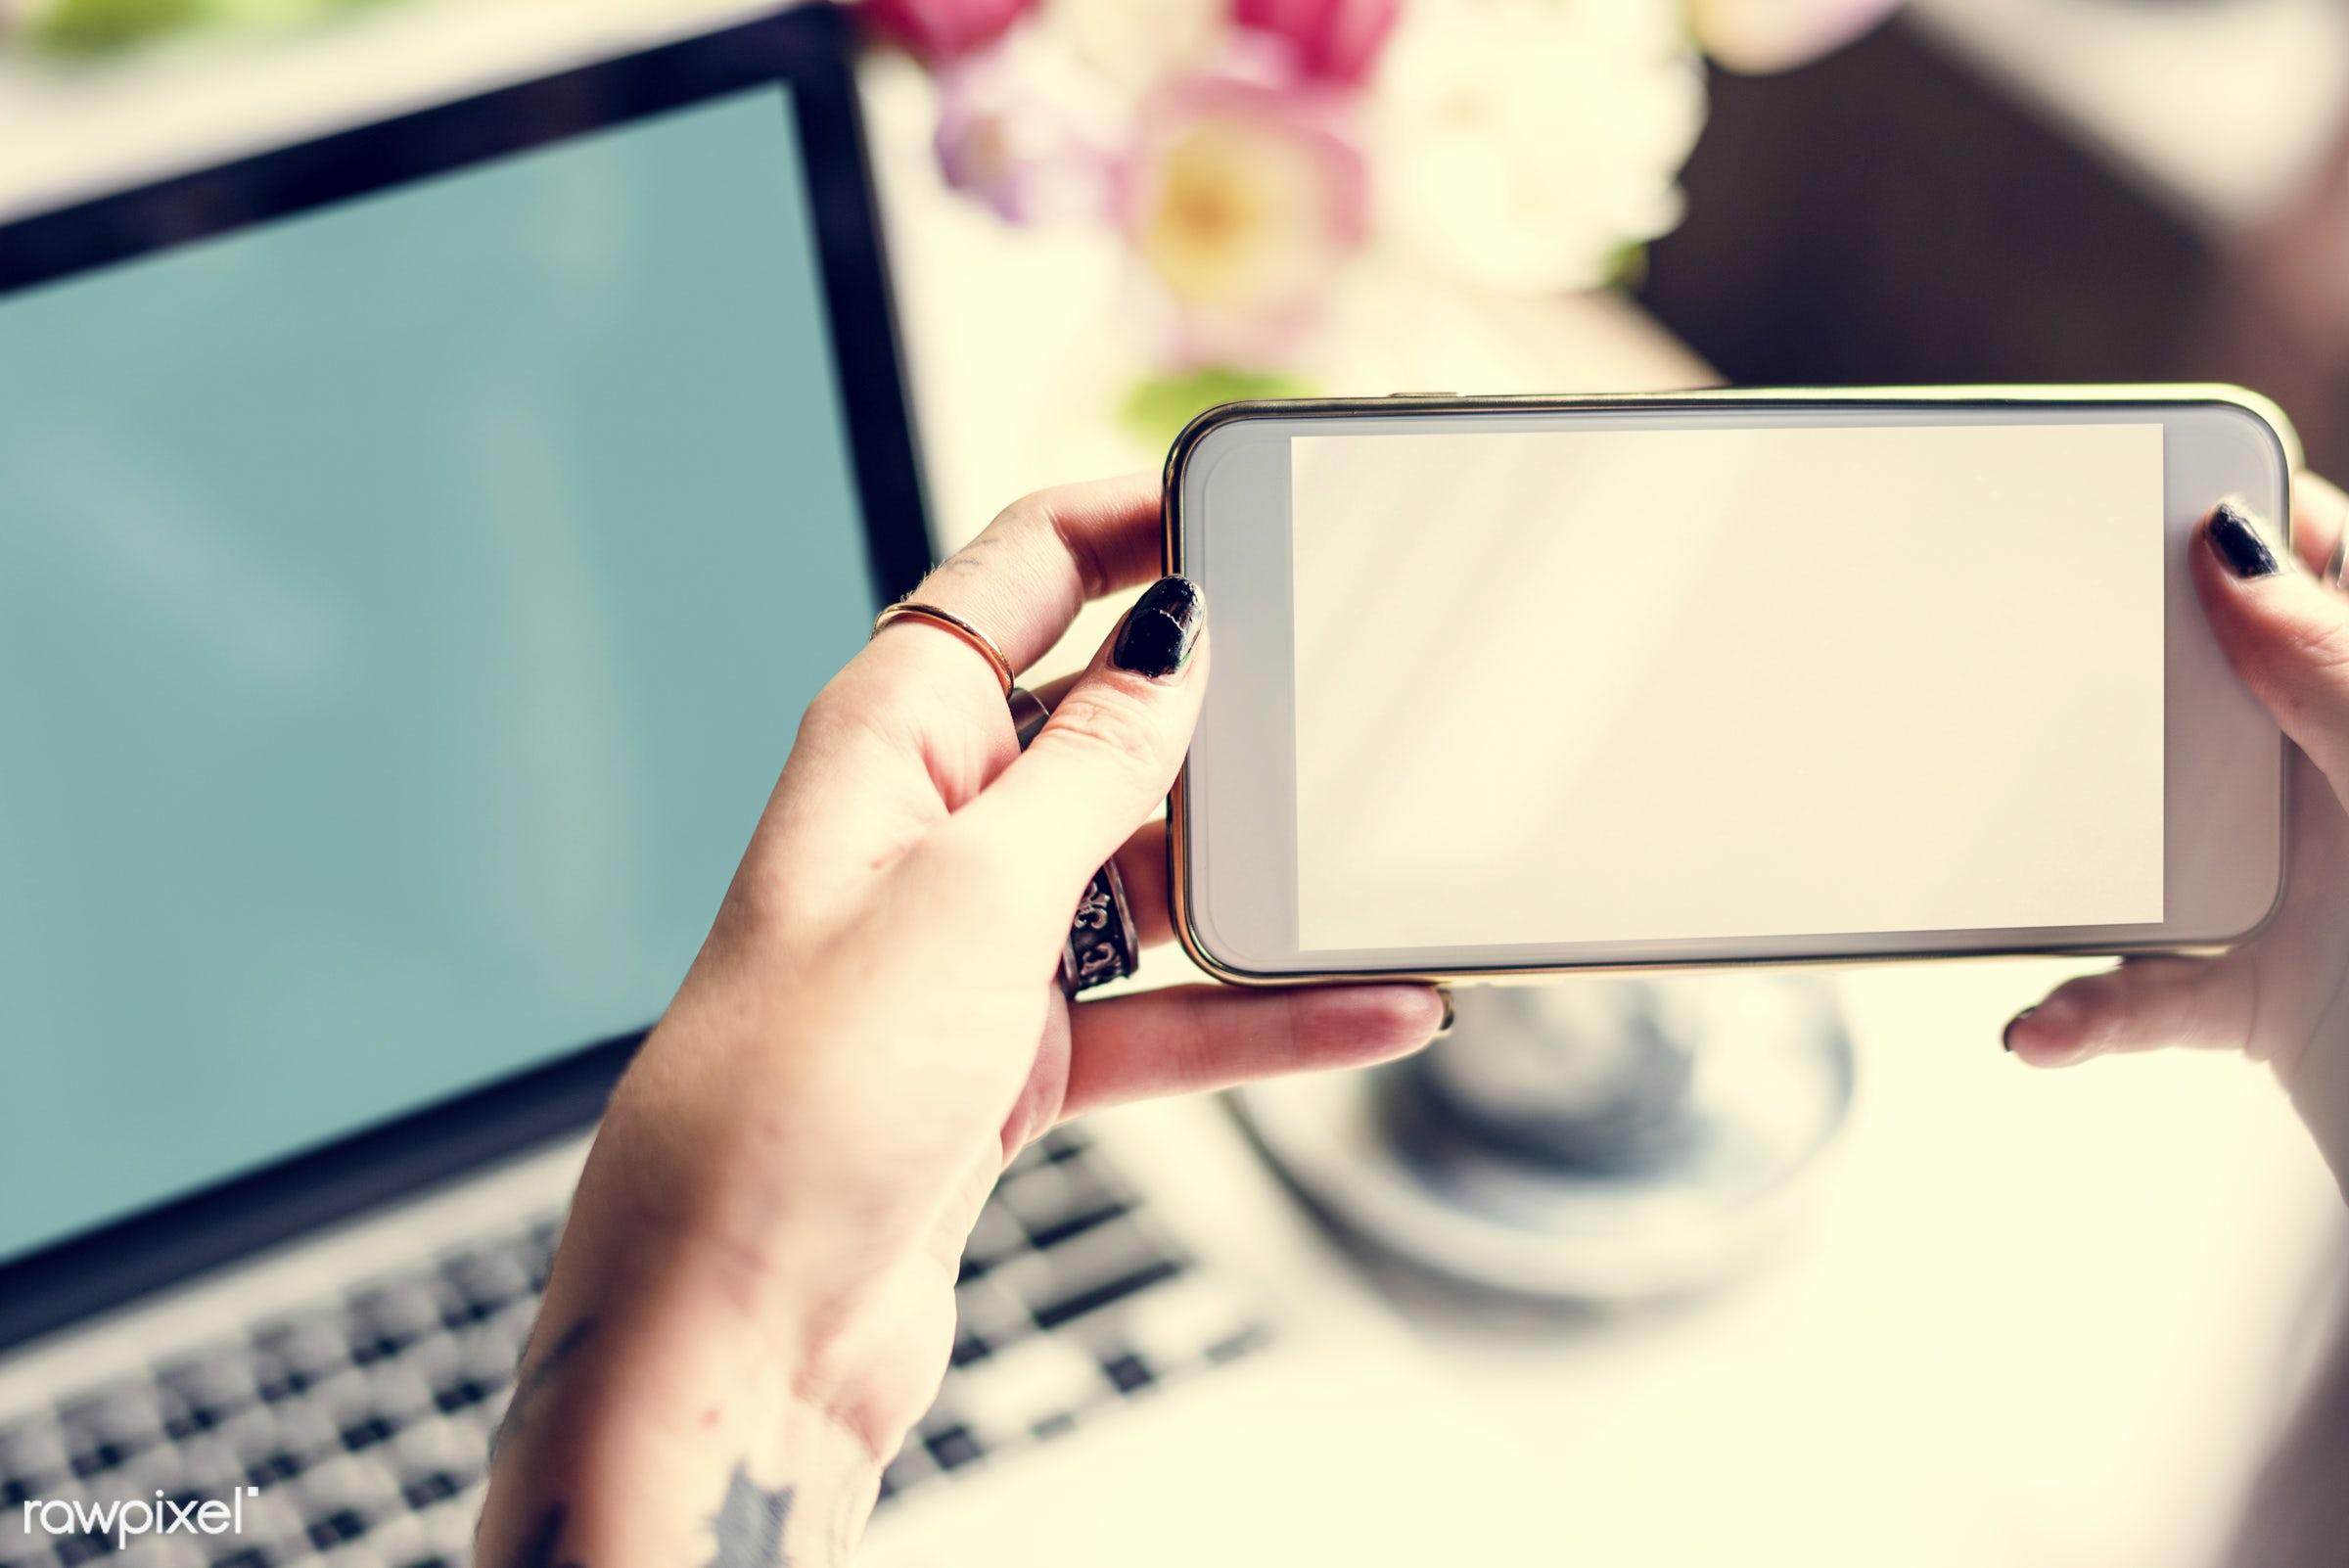 copy space, person, phone, snap, show, people, shot, tools, hands, cellphone, woman, capture, empty, laptop, feminine,...